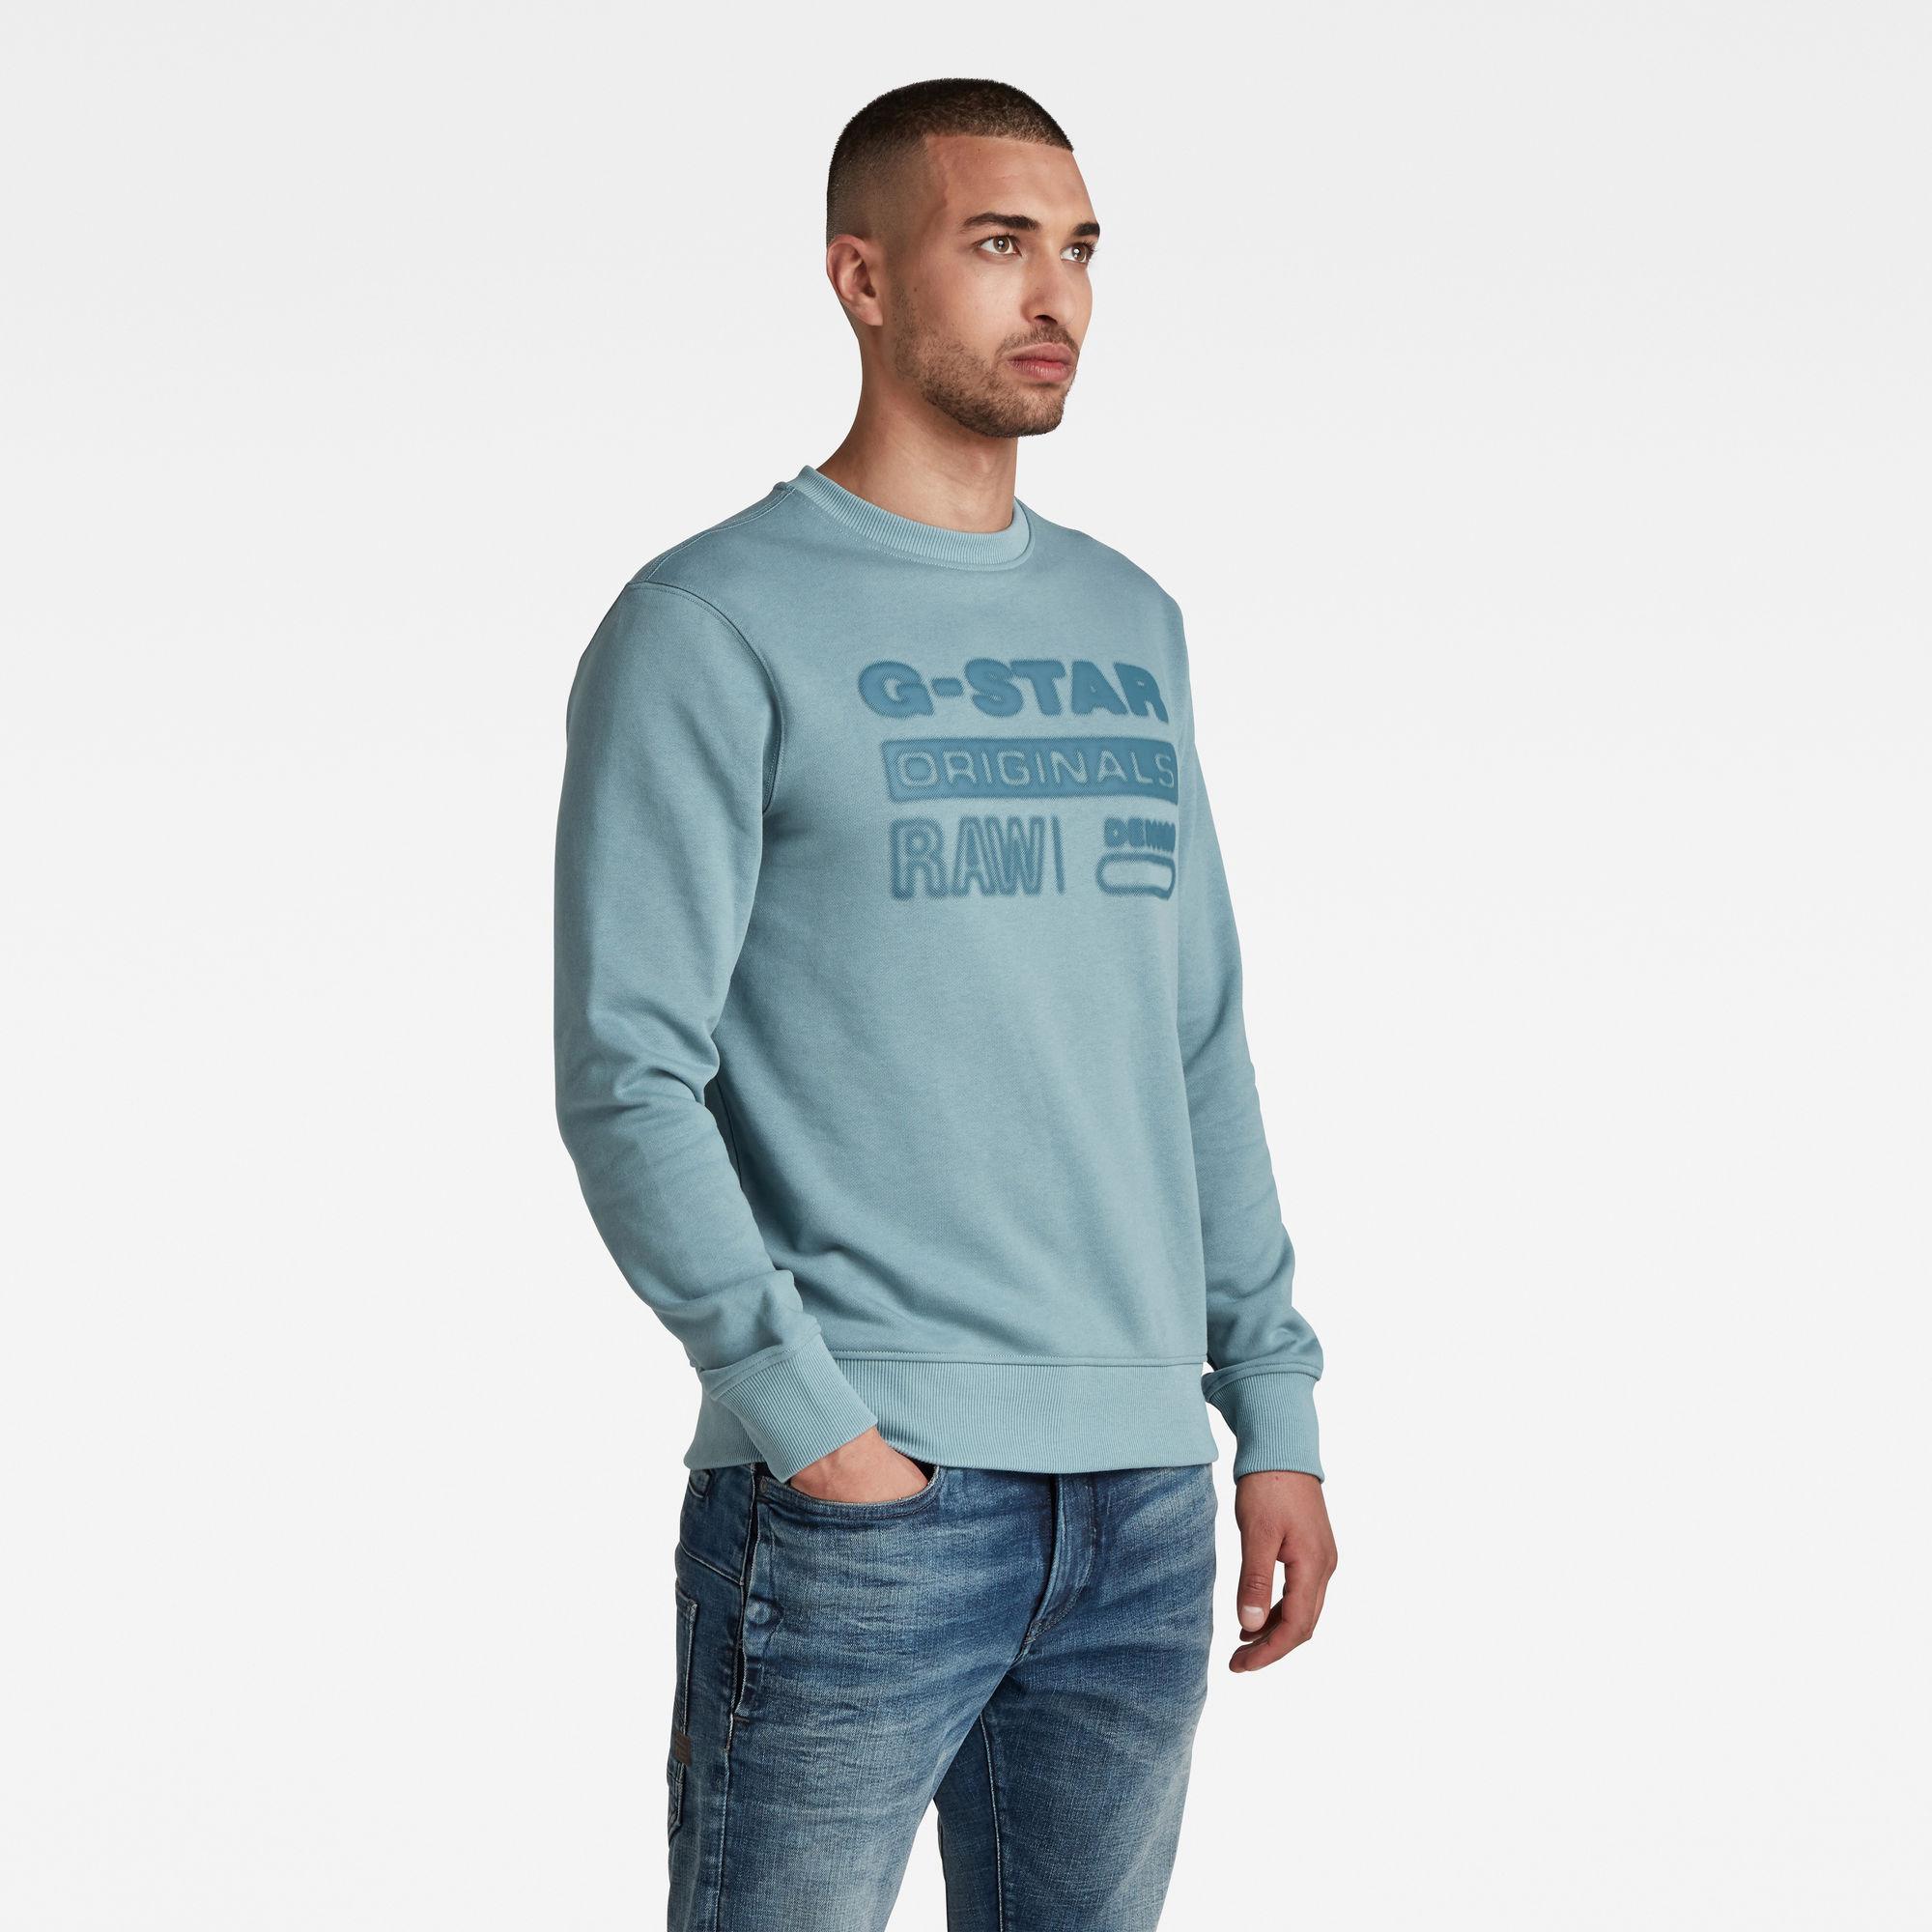 G-Star RAW Heren Originals Logo Sweater Grijs